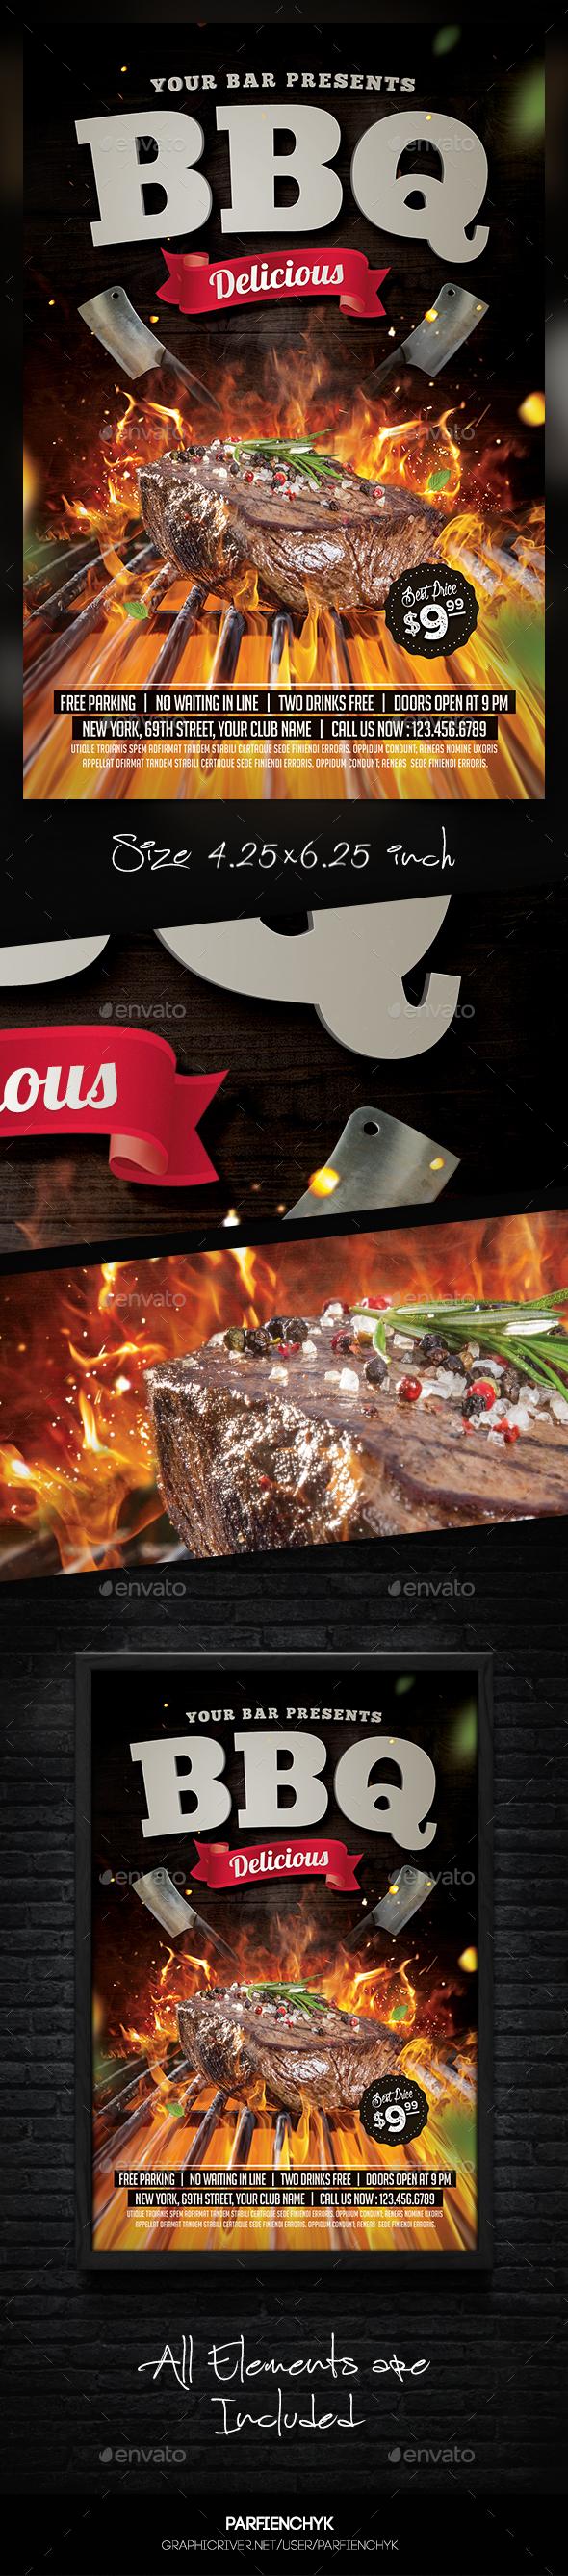 Steak Bbq Flyer Template By Parfienchyk Graphicriver